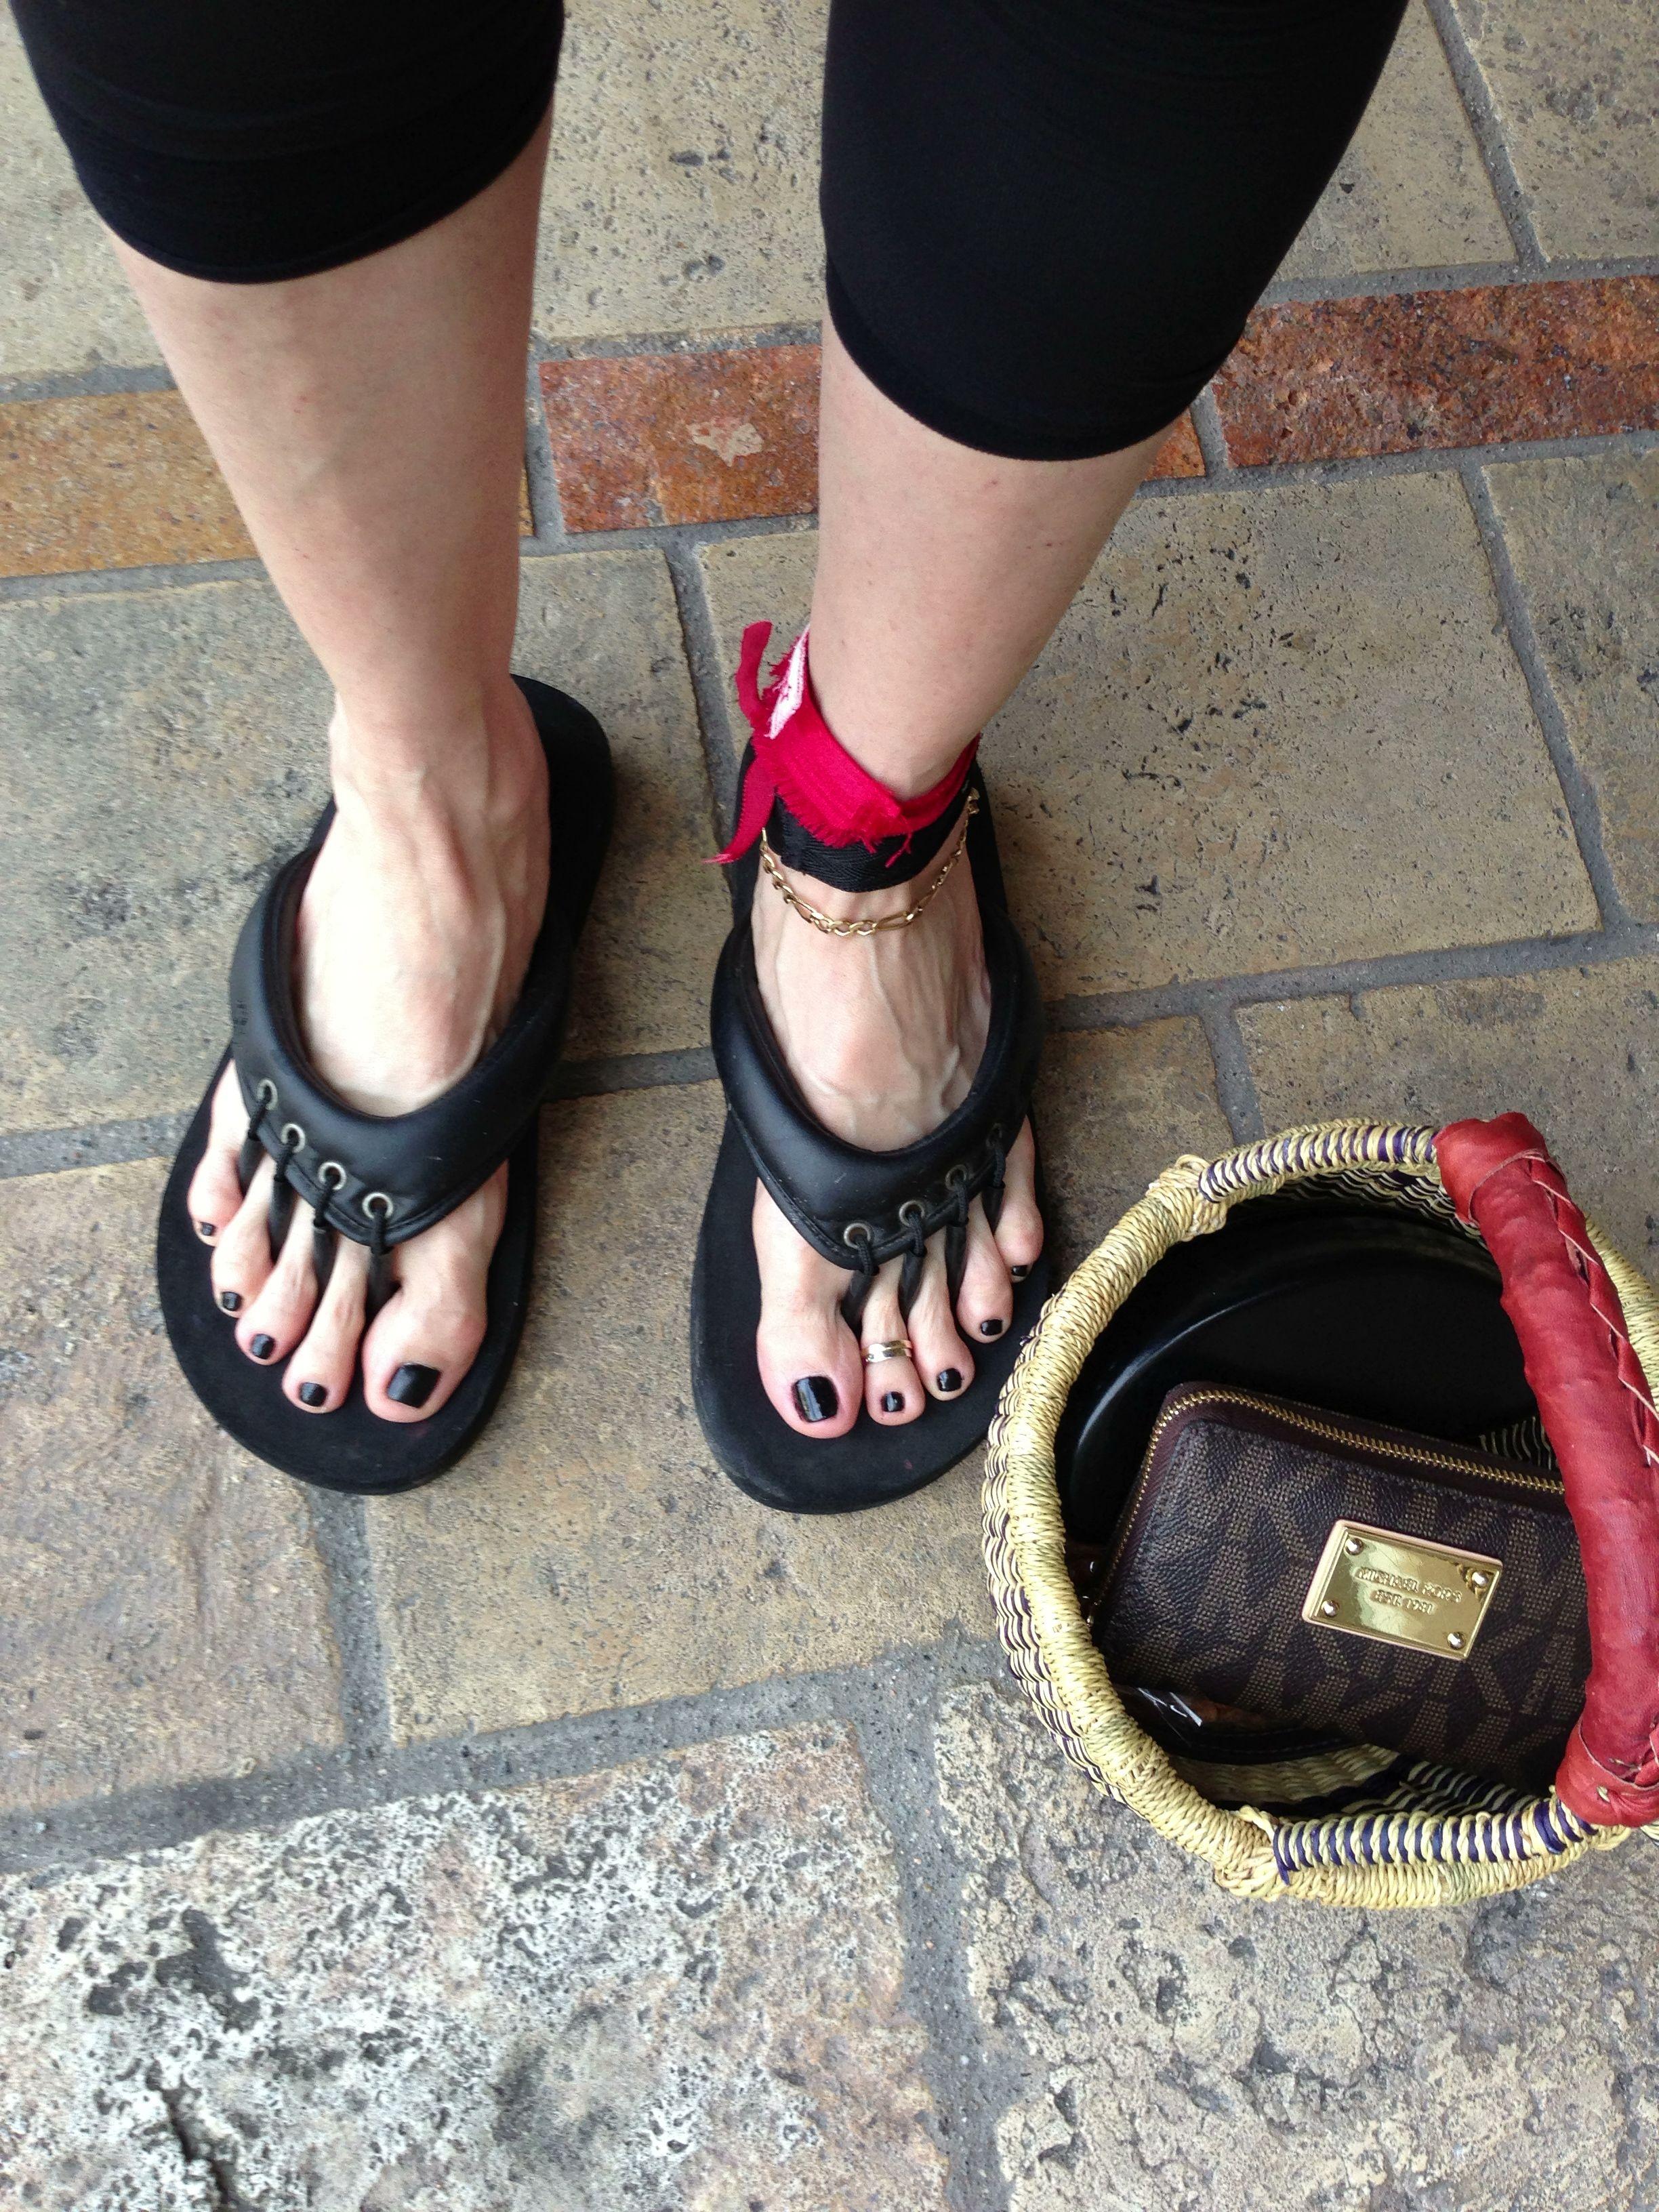 Spring Yoga Toe Sandals Http Www Yogasandals Com Shop